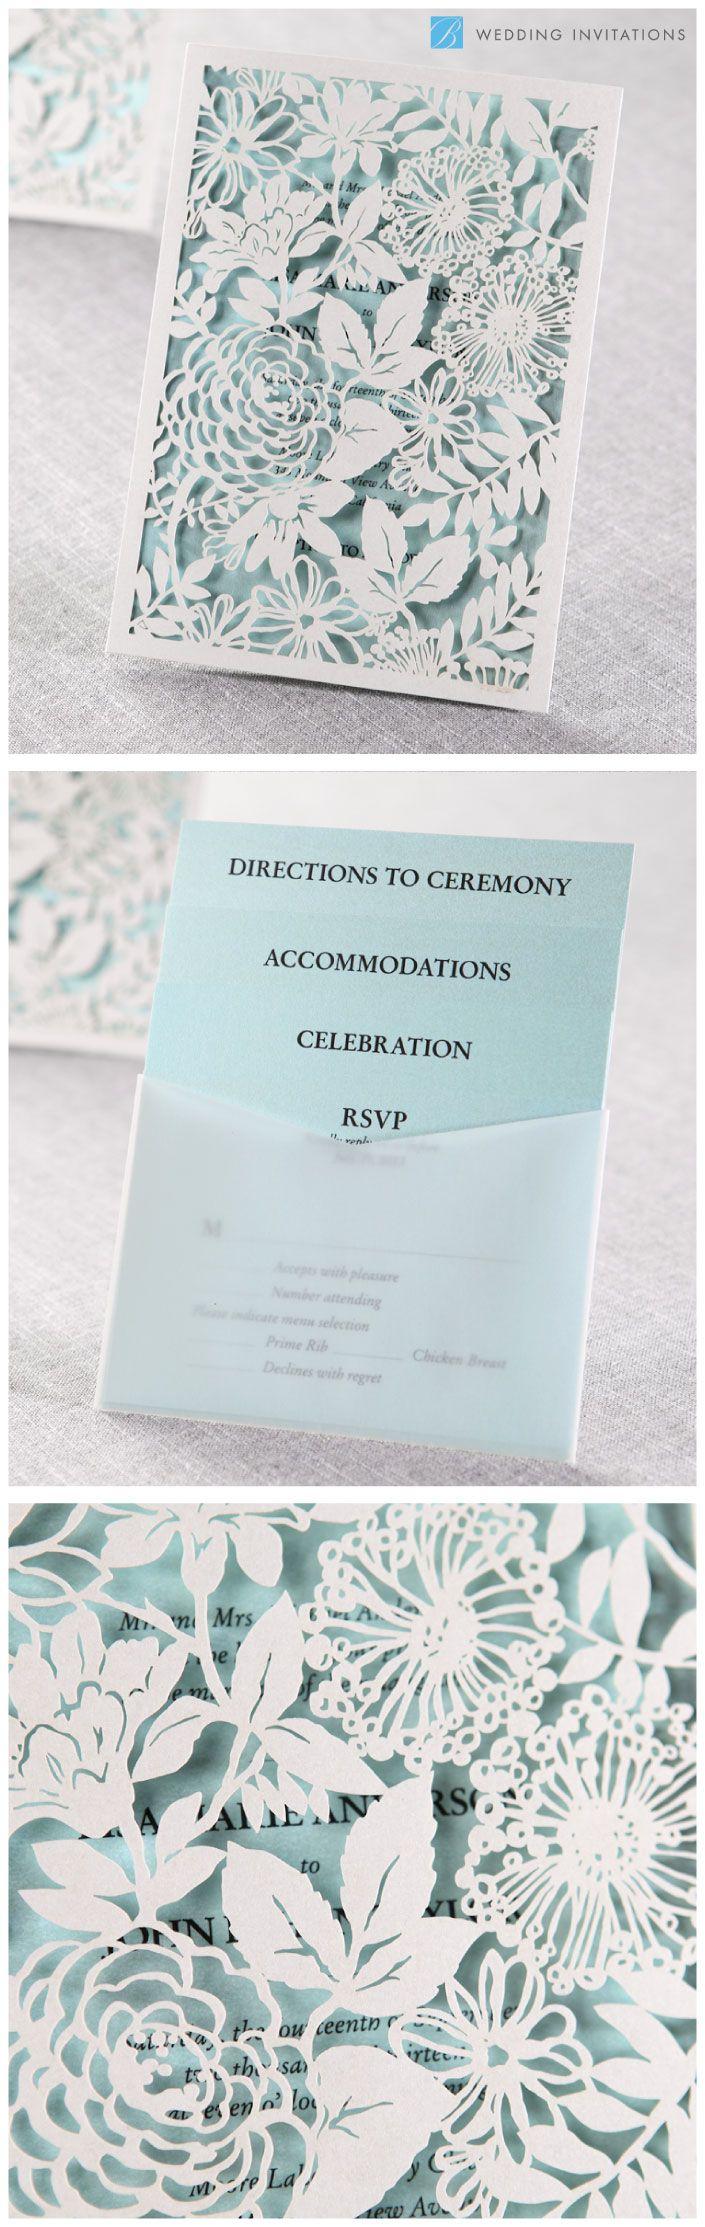 Magical Garden Invitation by B Wedding Invitations  #invitations  #wedding  #lasercut